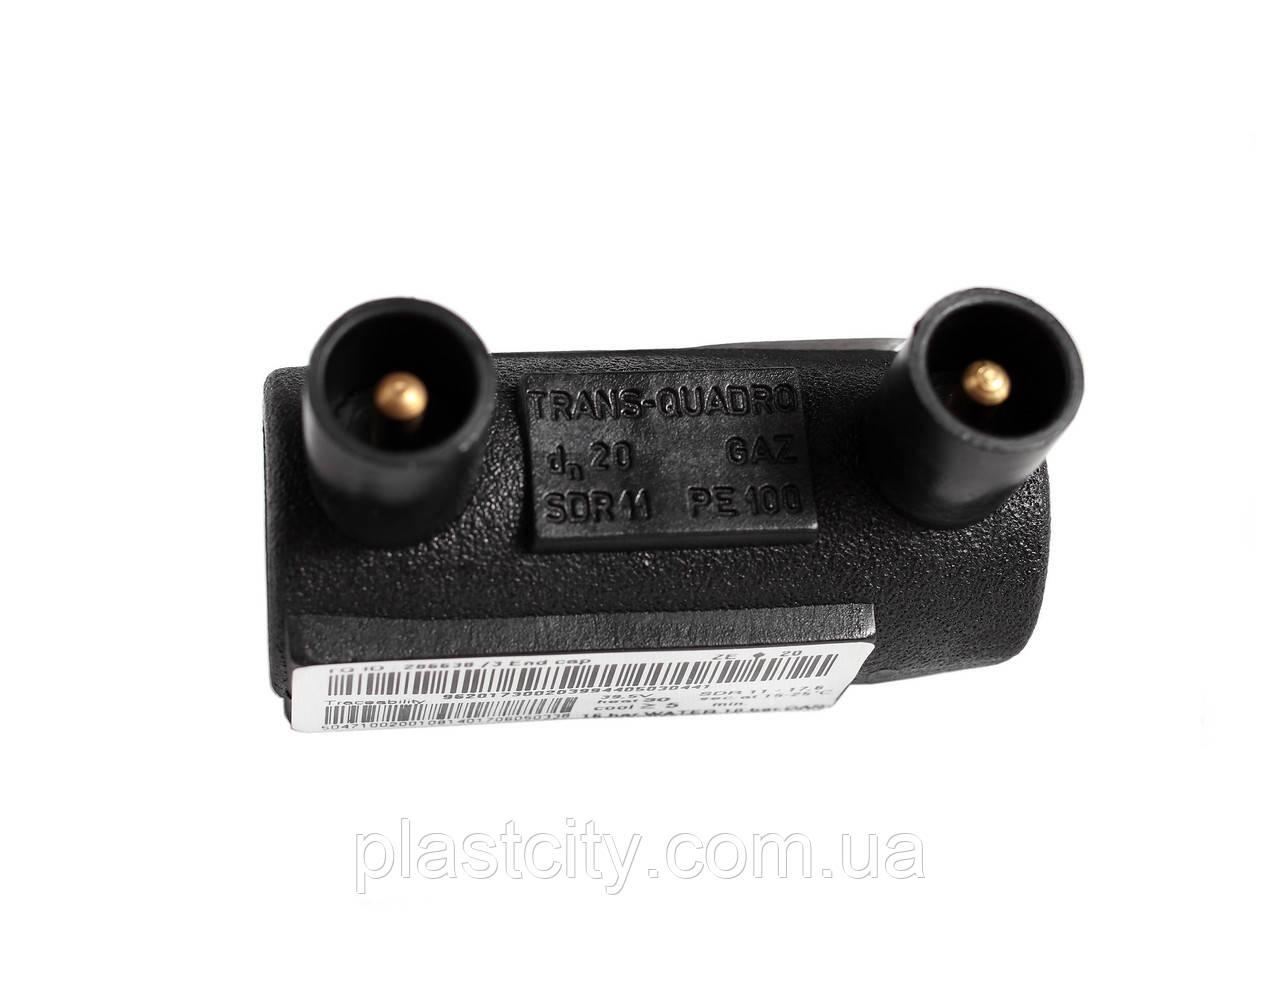 Муфта терморезисторная 32 мм ПЭ100 SDR11